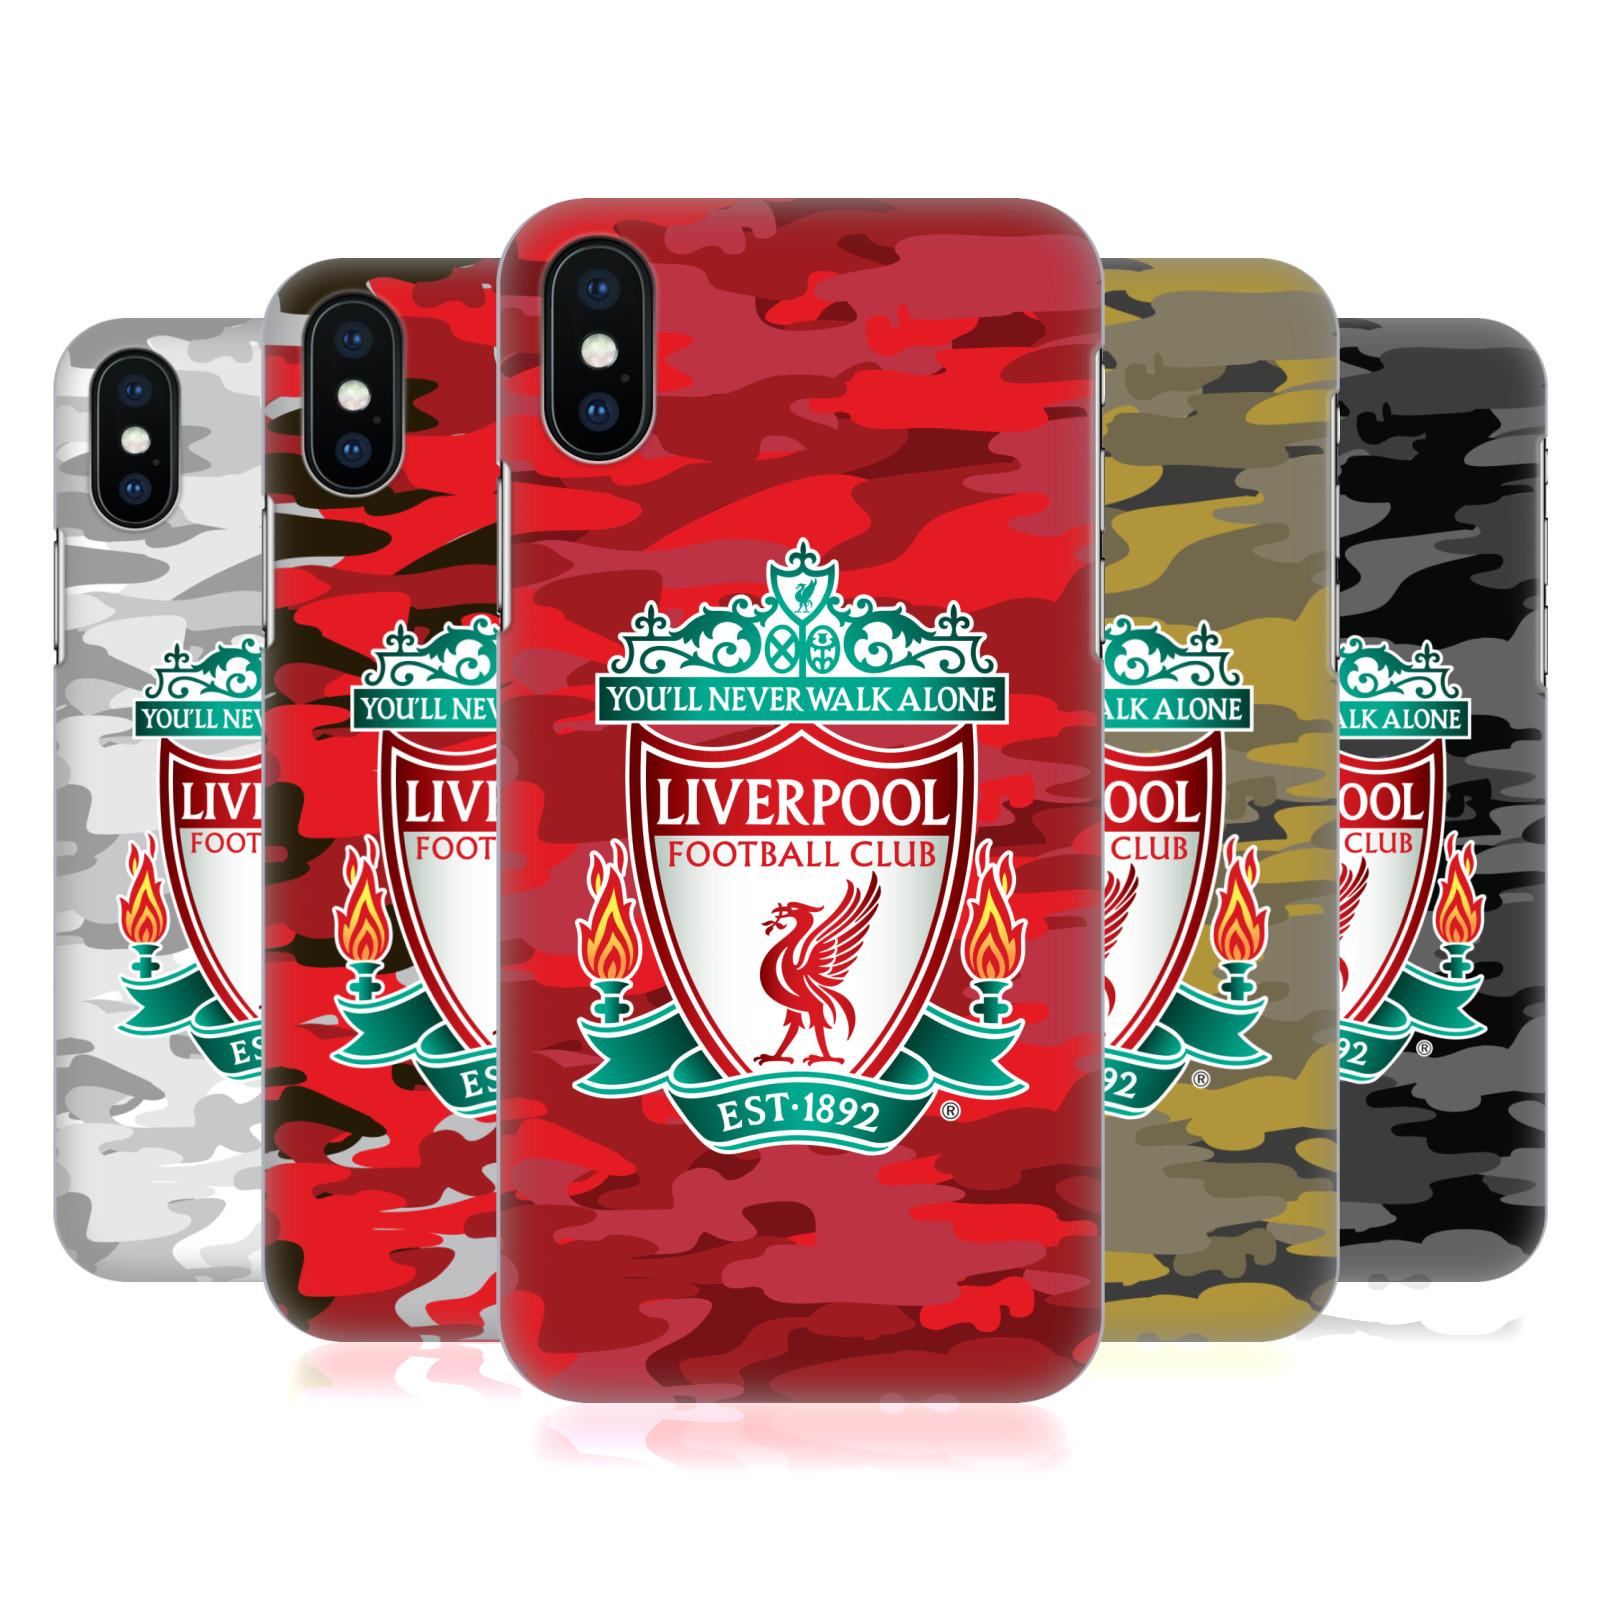 Liverpool Football Club Camou